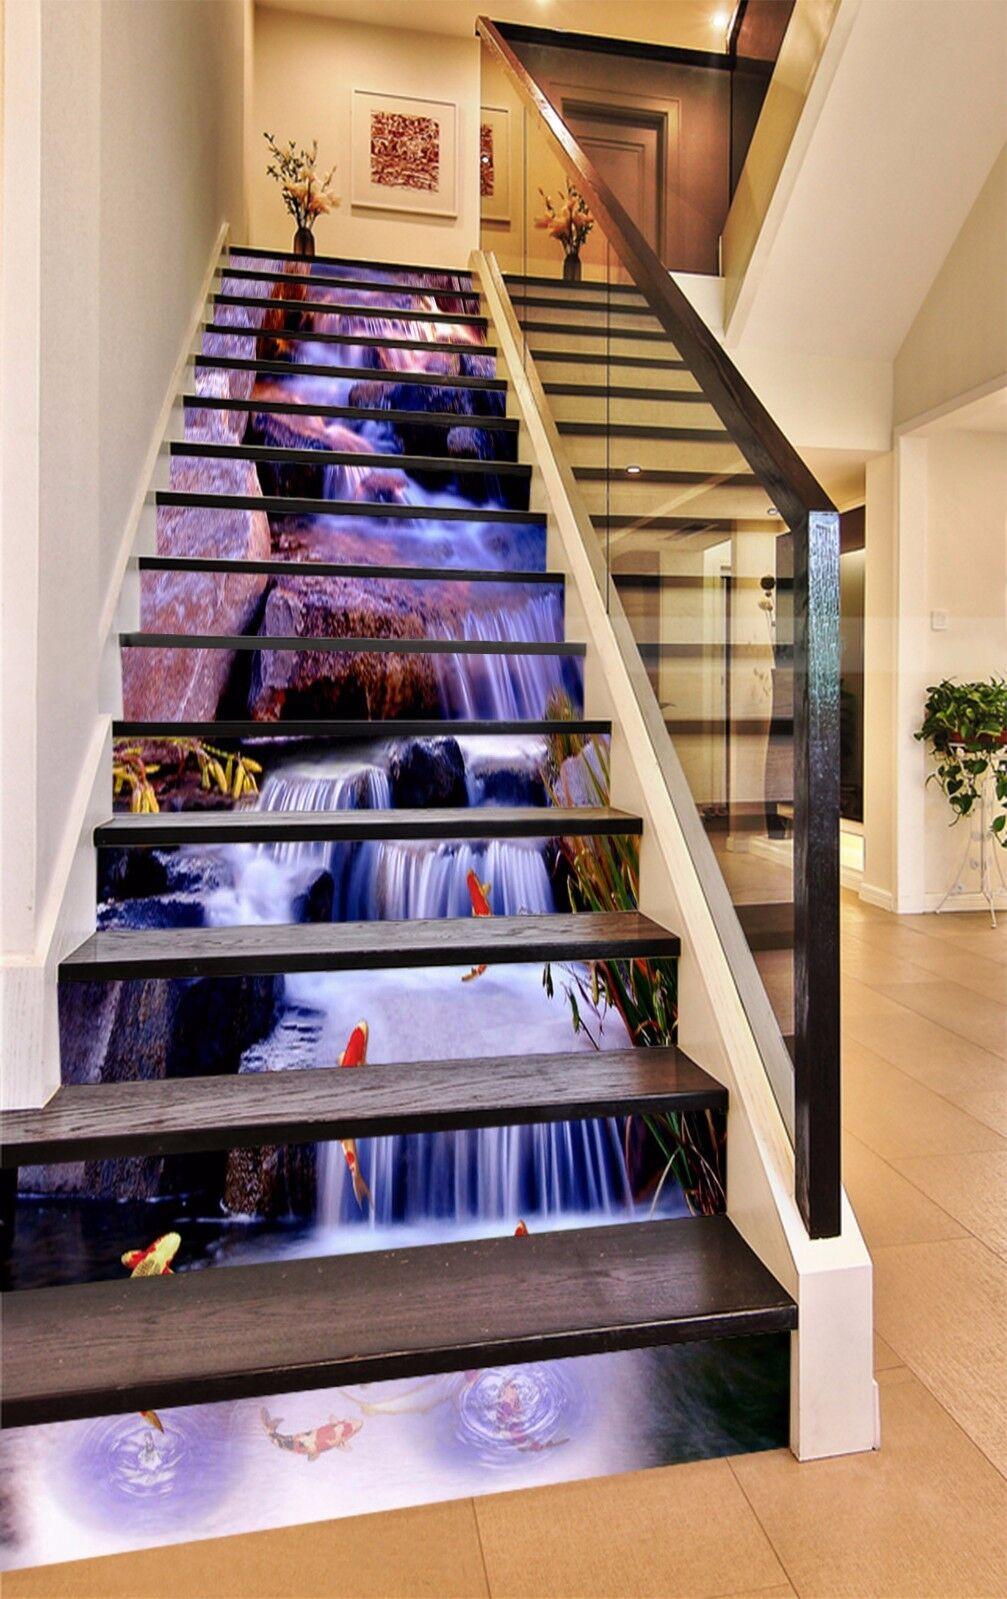 3D Stream Fish 9311 Stair Risers Decoration Photo Mural Vinyl Decal Wallpaper AU